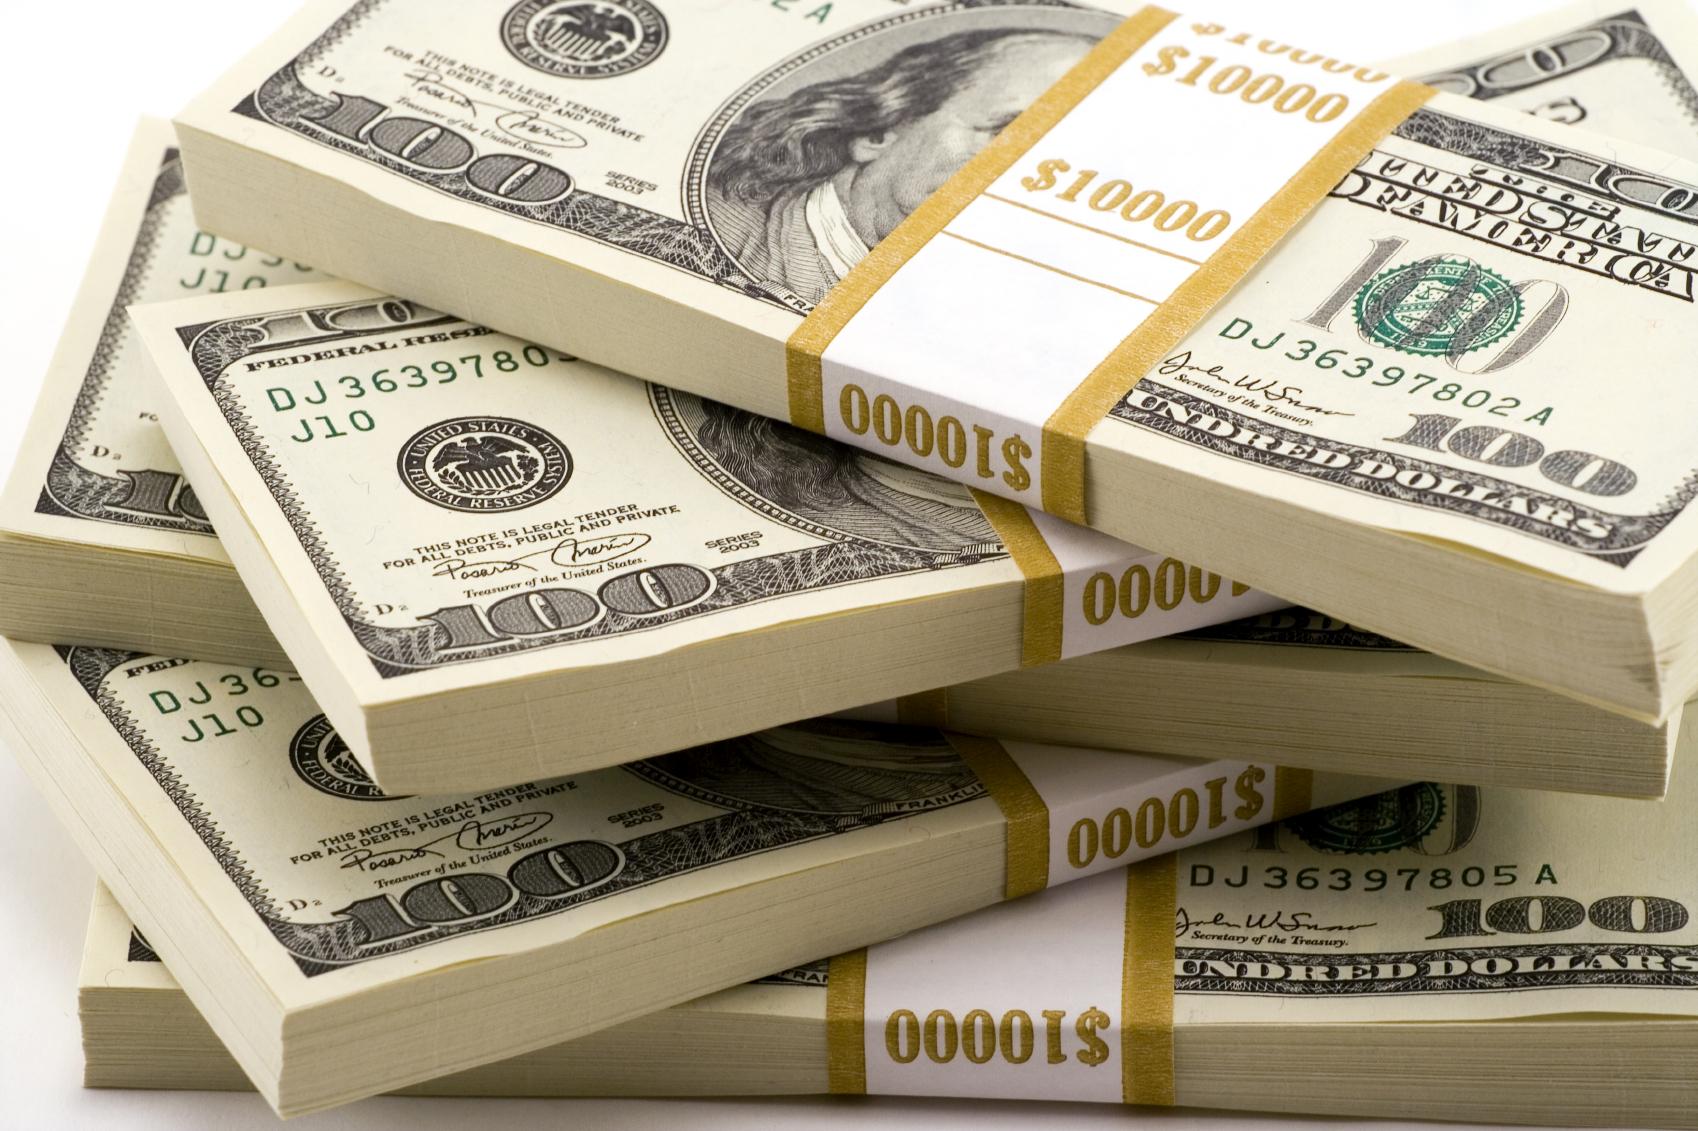 Real Cash Economy (Make Money in Virtual Worlds) | Weird Community Wiki | Fandom powered by Wikia